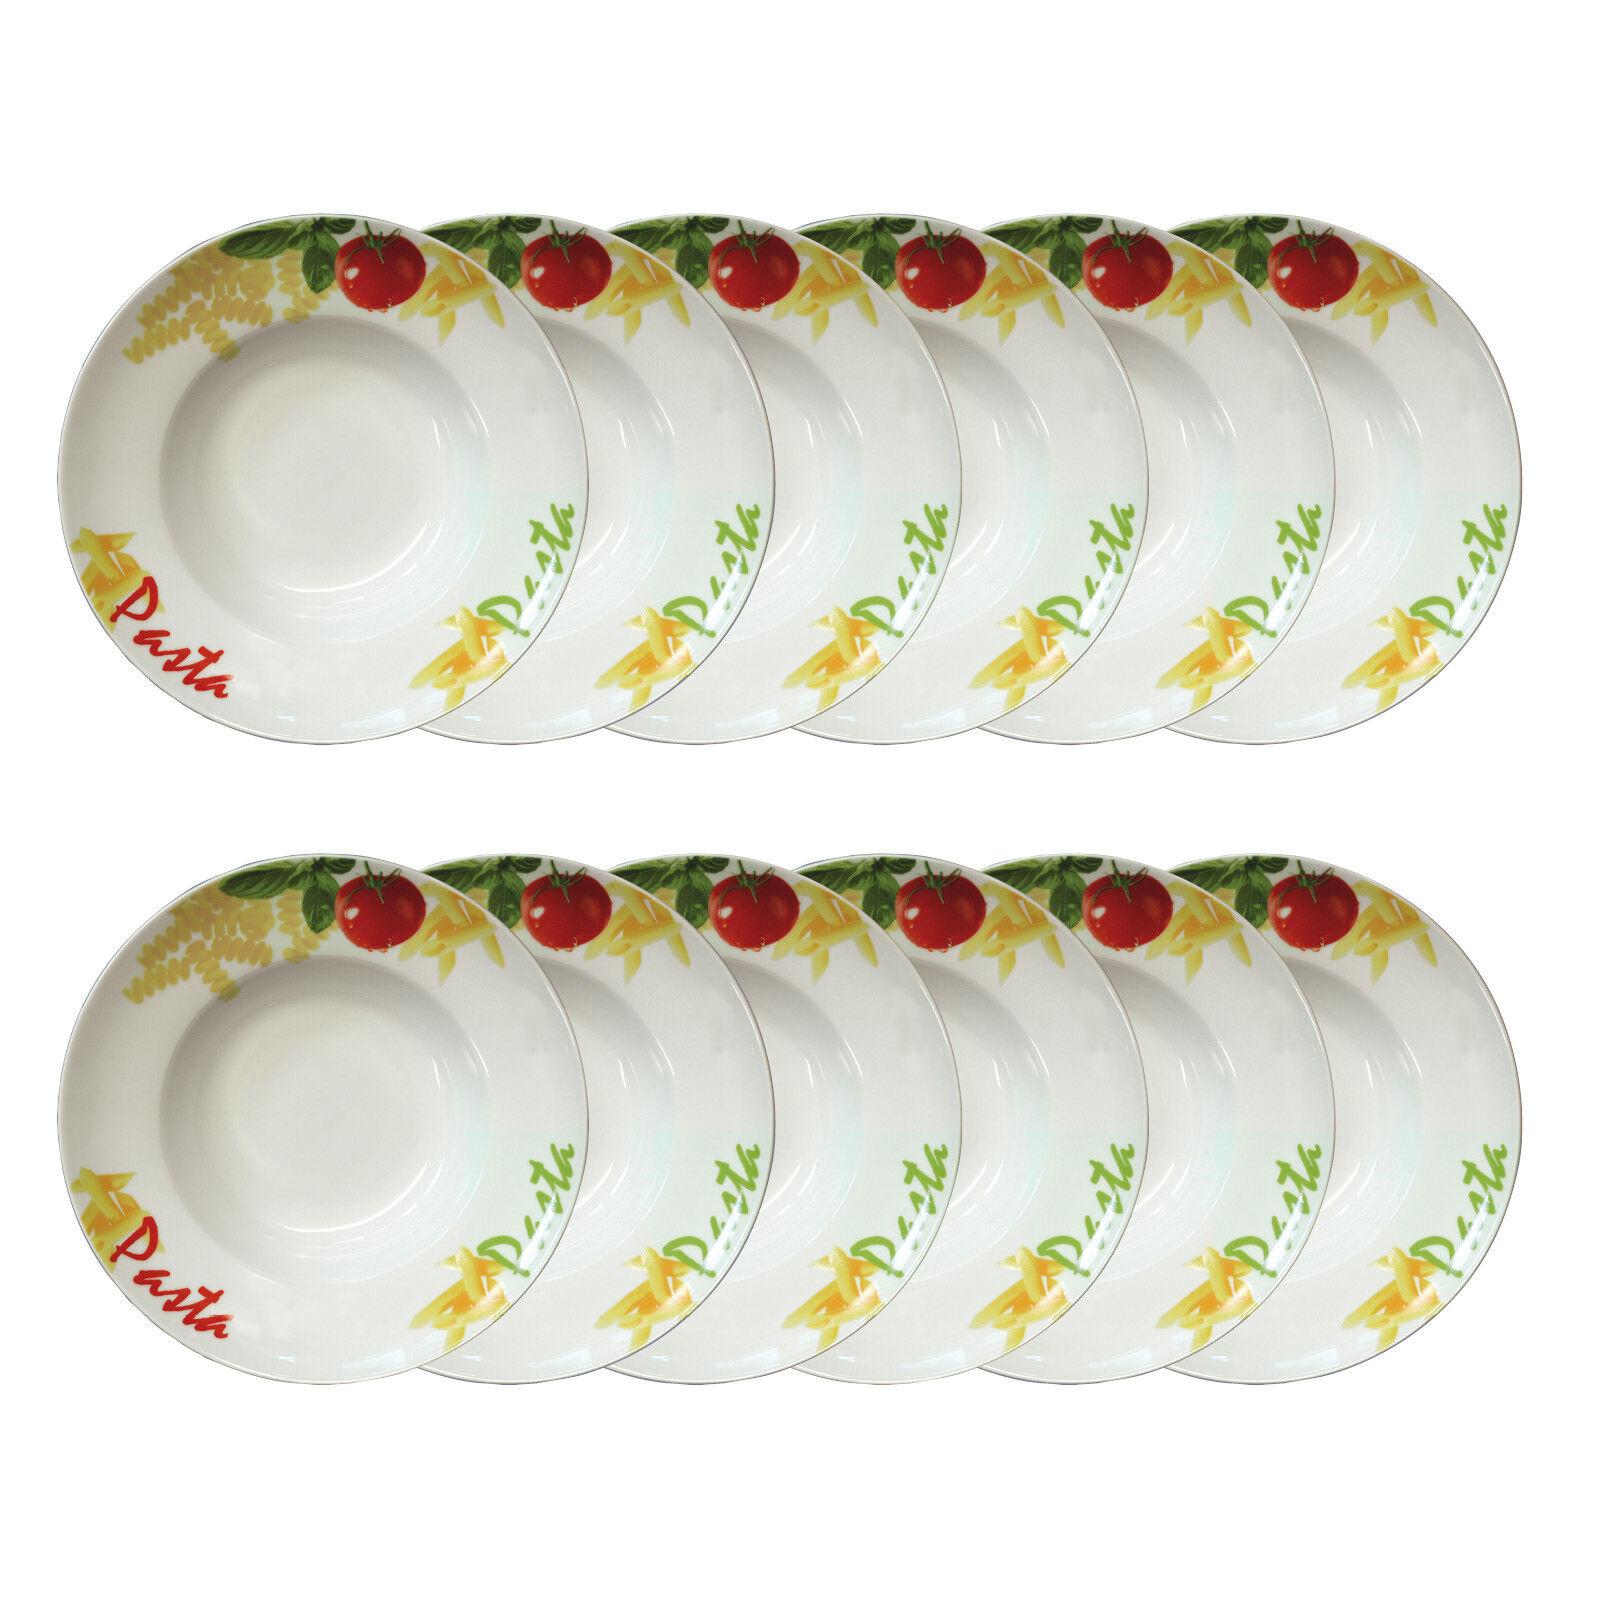 Gastro Pastateller Nudelteller Salatteller 270mm Durchmesser 30er-Set 30 Teller   | Billig ideal